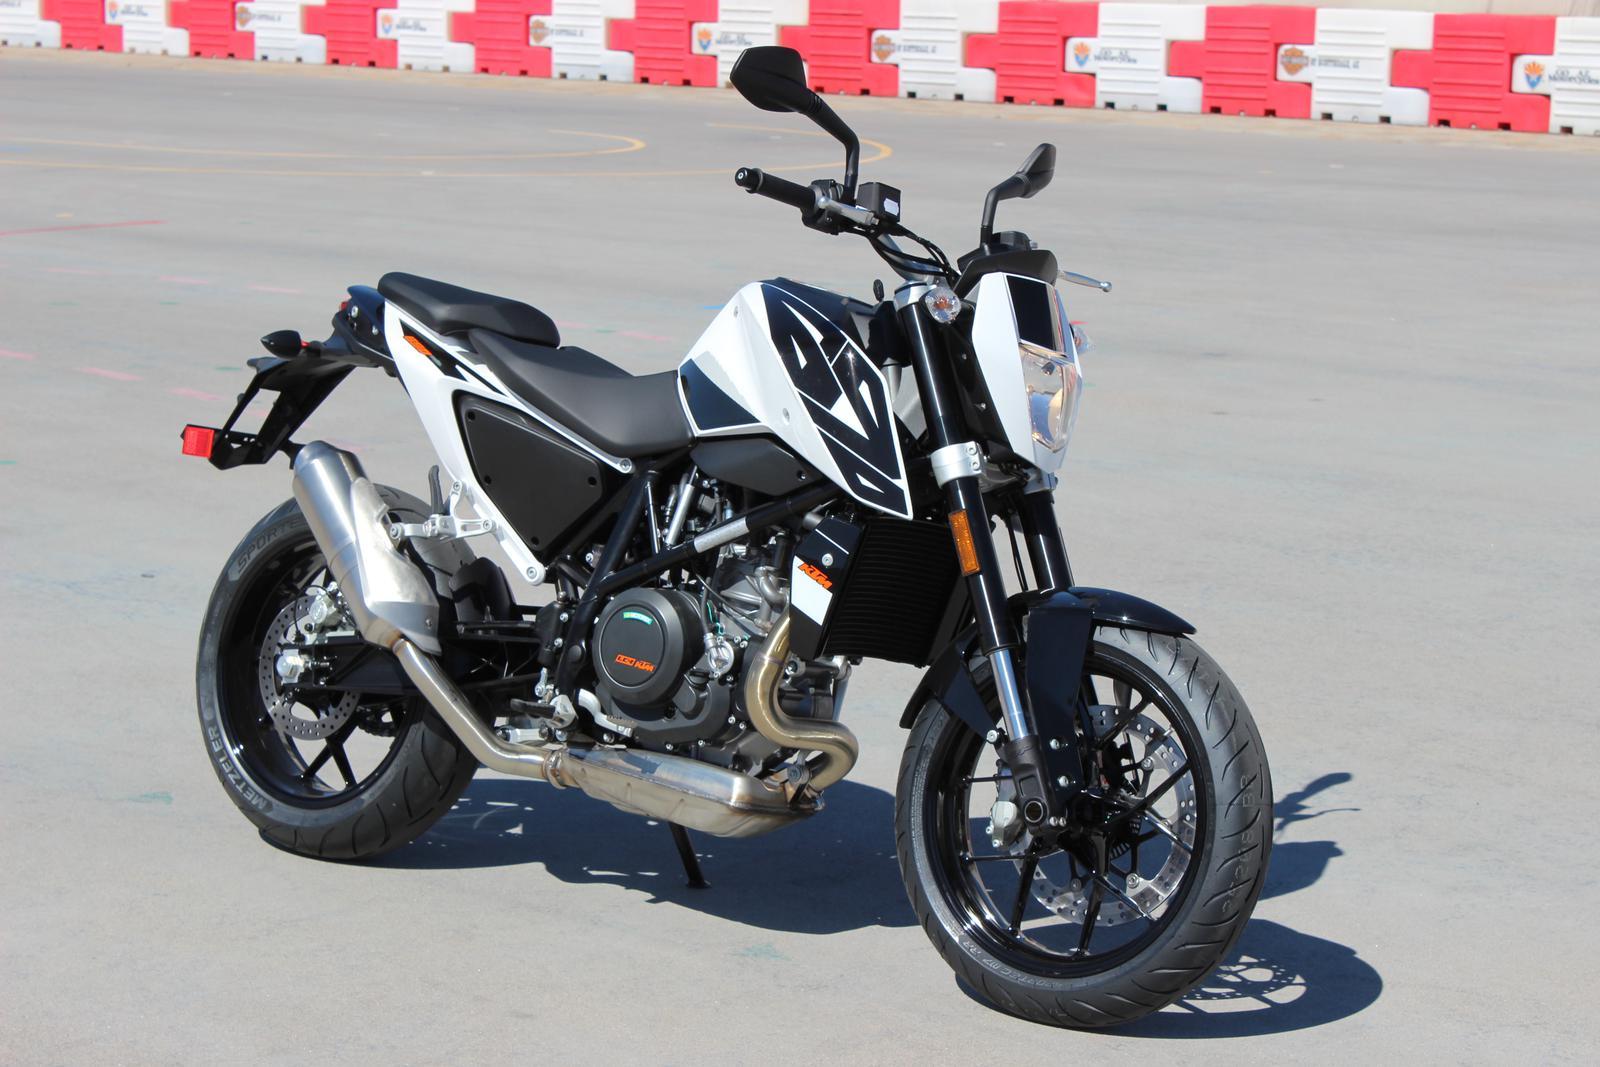 2018 KTM 690 DUKE for sale in Scottsdale, AZ   GO AZ Motorcycles in ...